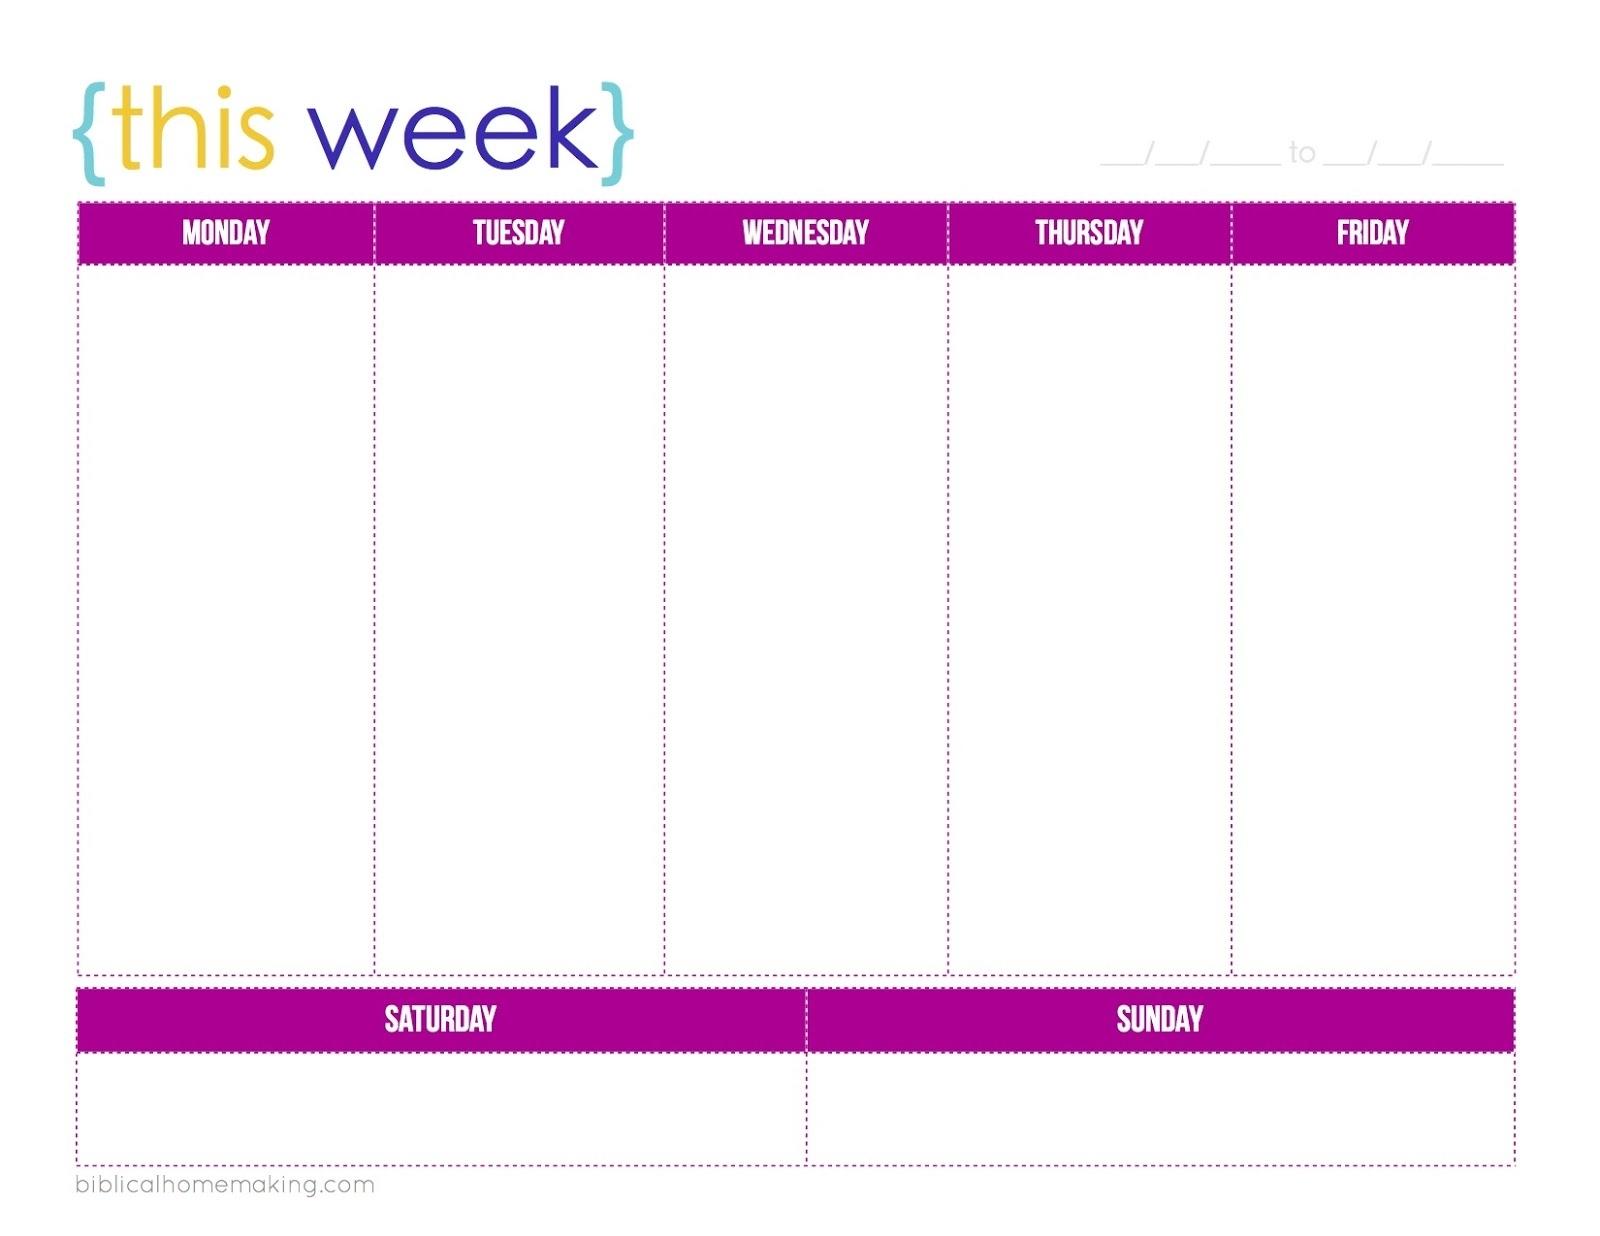 5 Day Week Calendar Printable | Calendar 2018 Design  Blank Calendar Template 5 Day